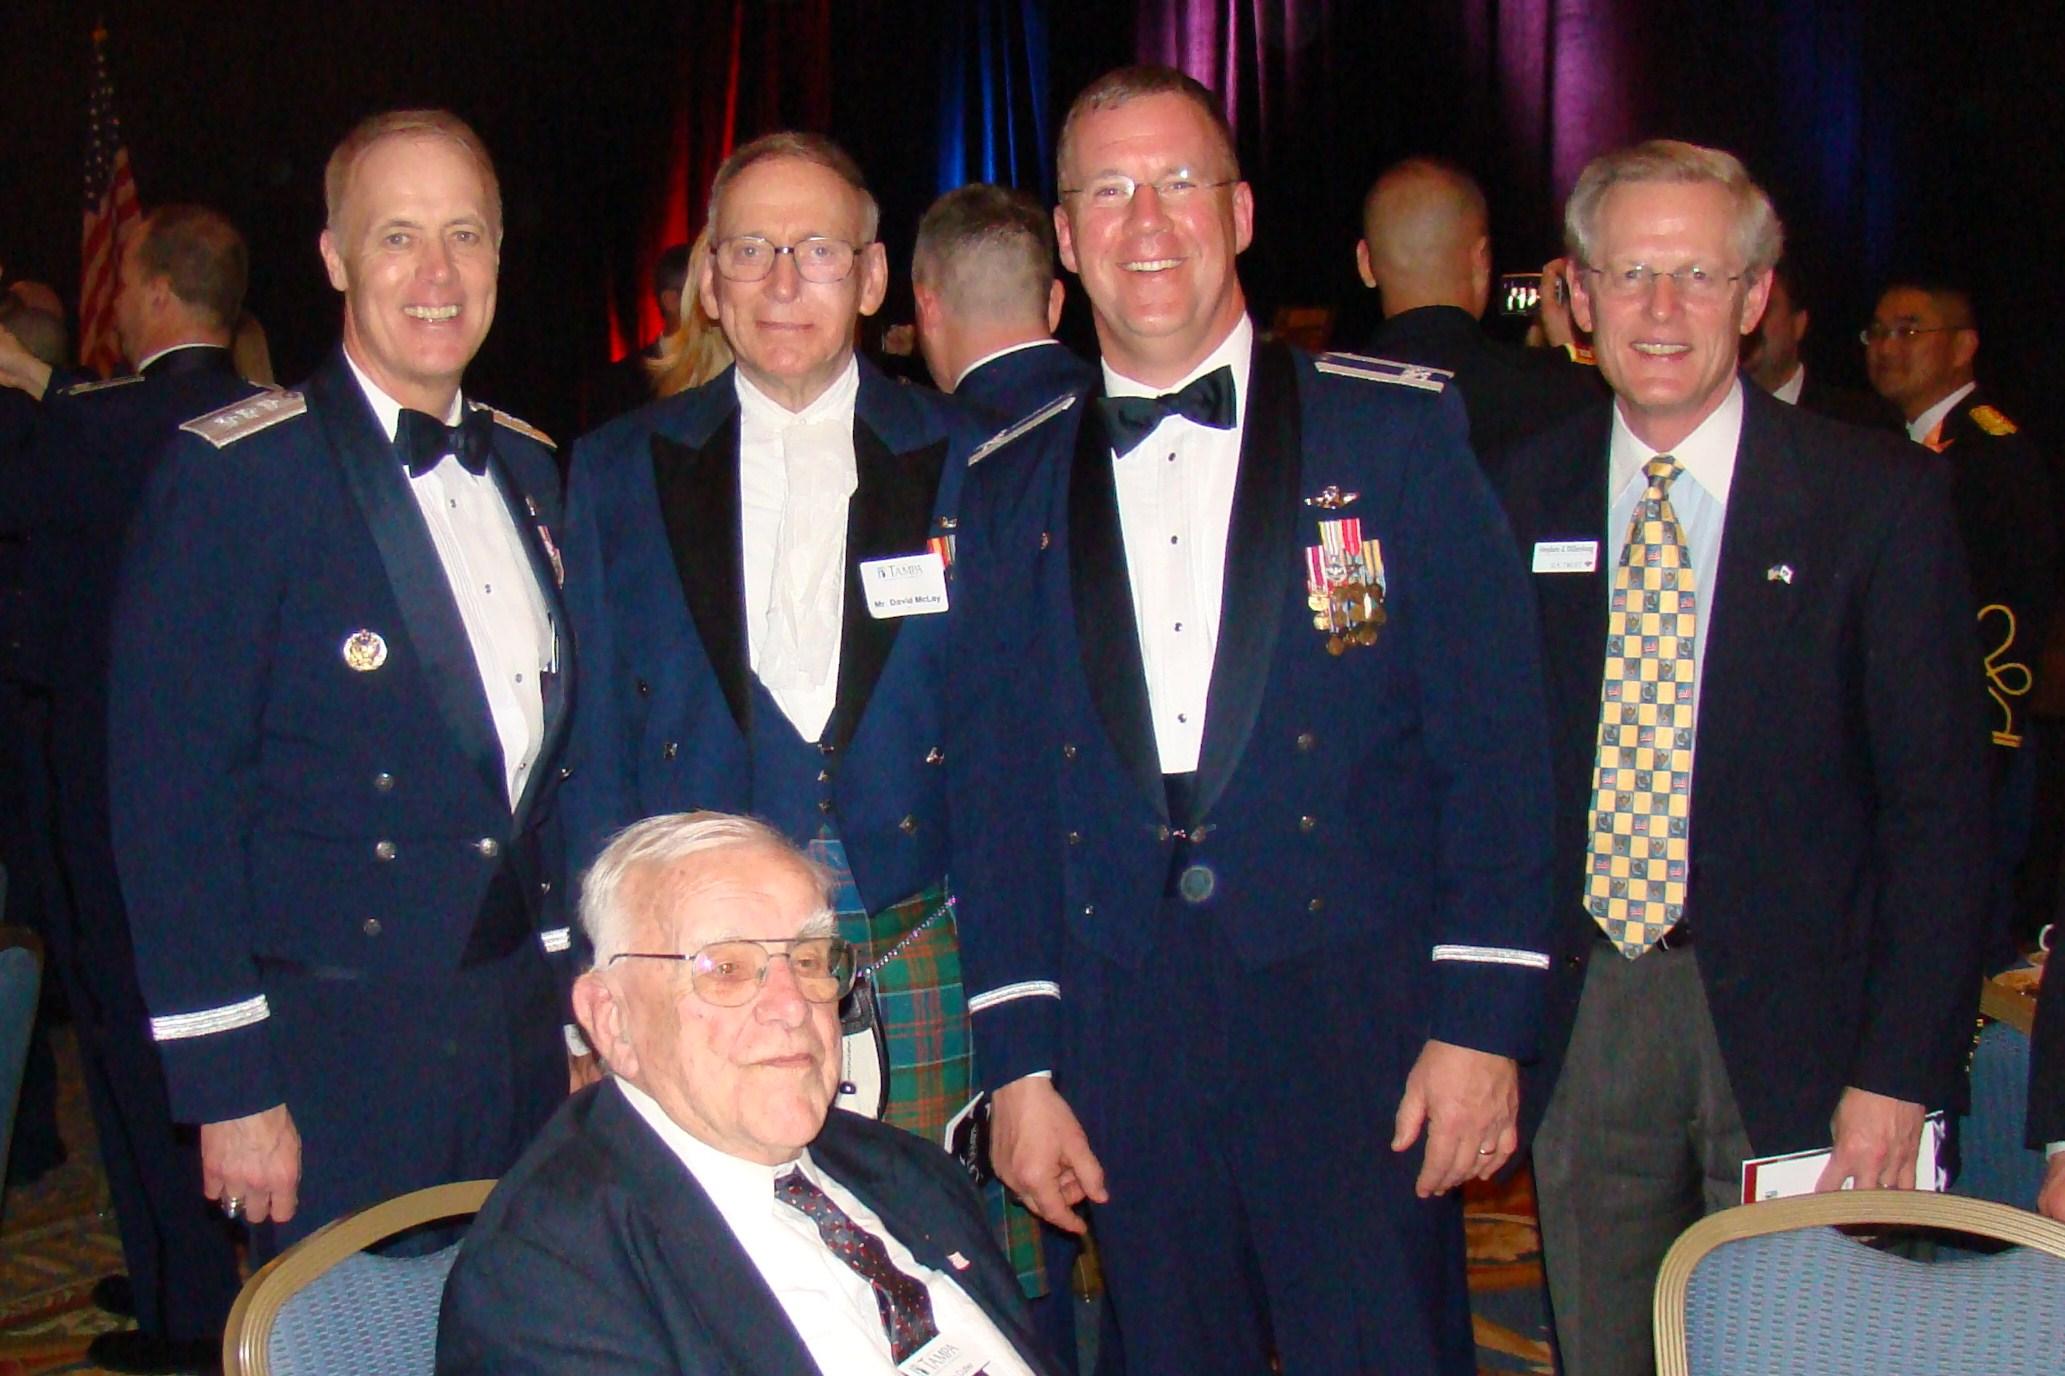 Dick, David McLay, Larry Martin & Steve Dillenburg with Bob Cutler, 16 Feb '10.JPG